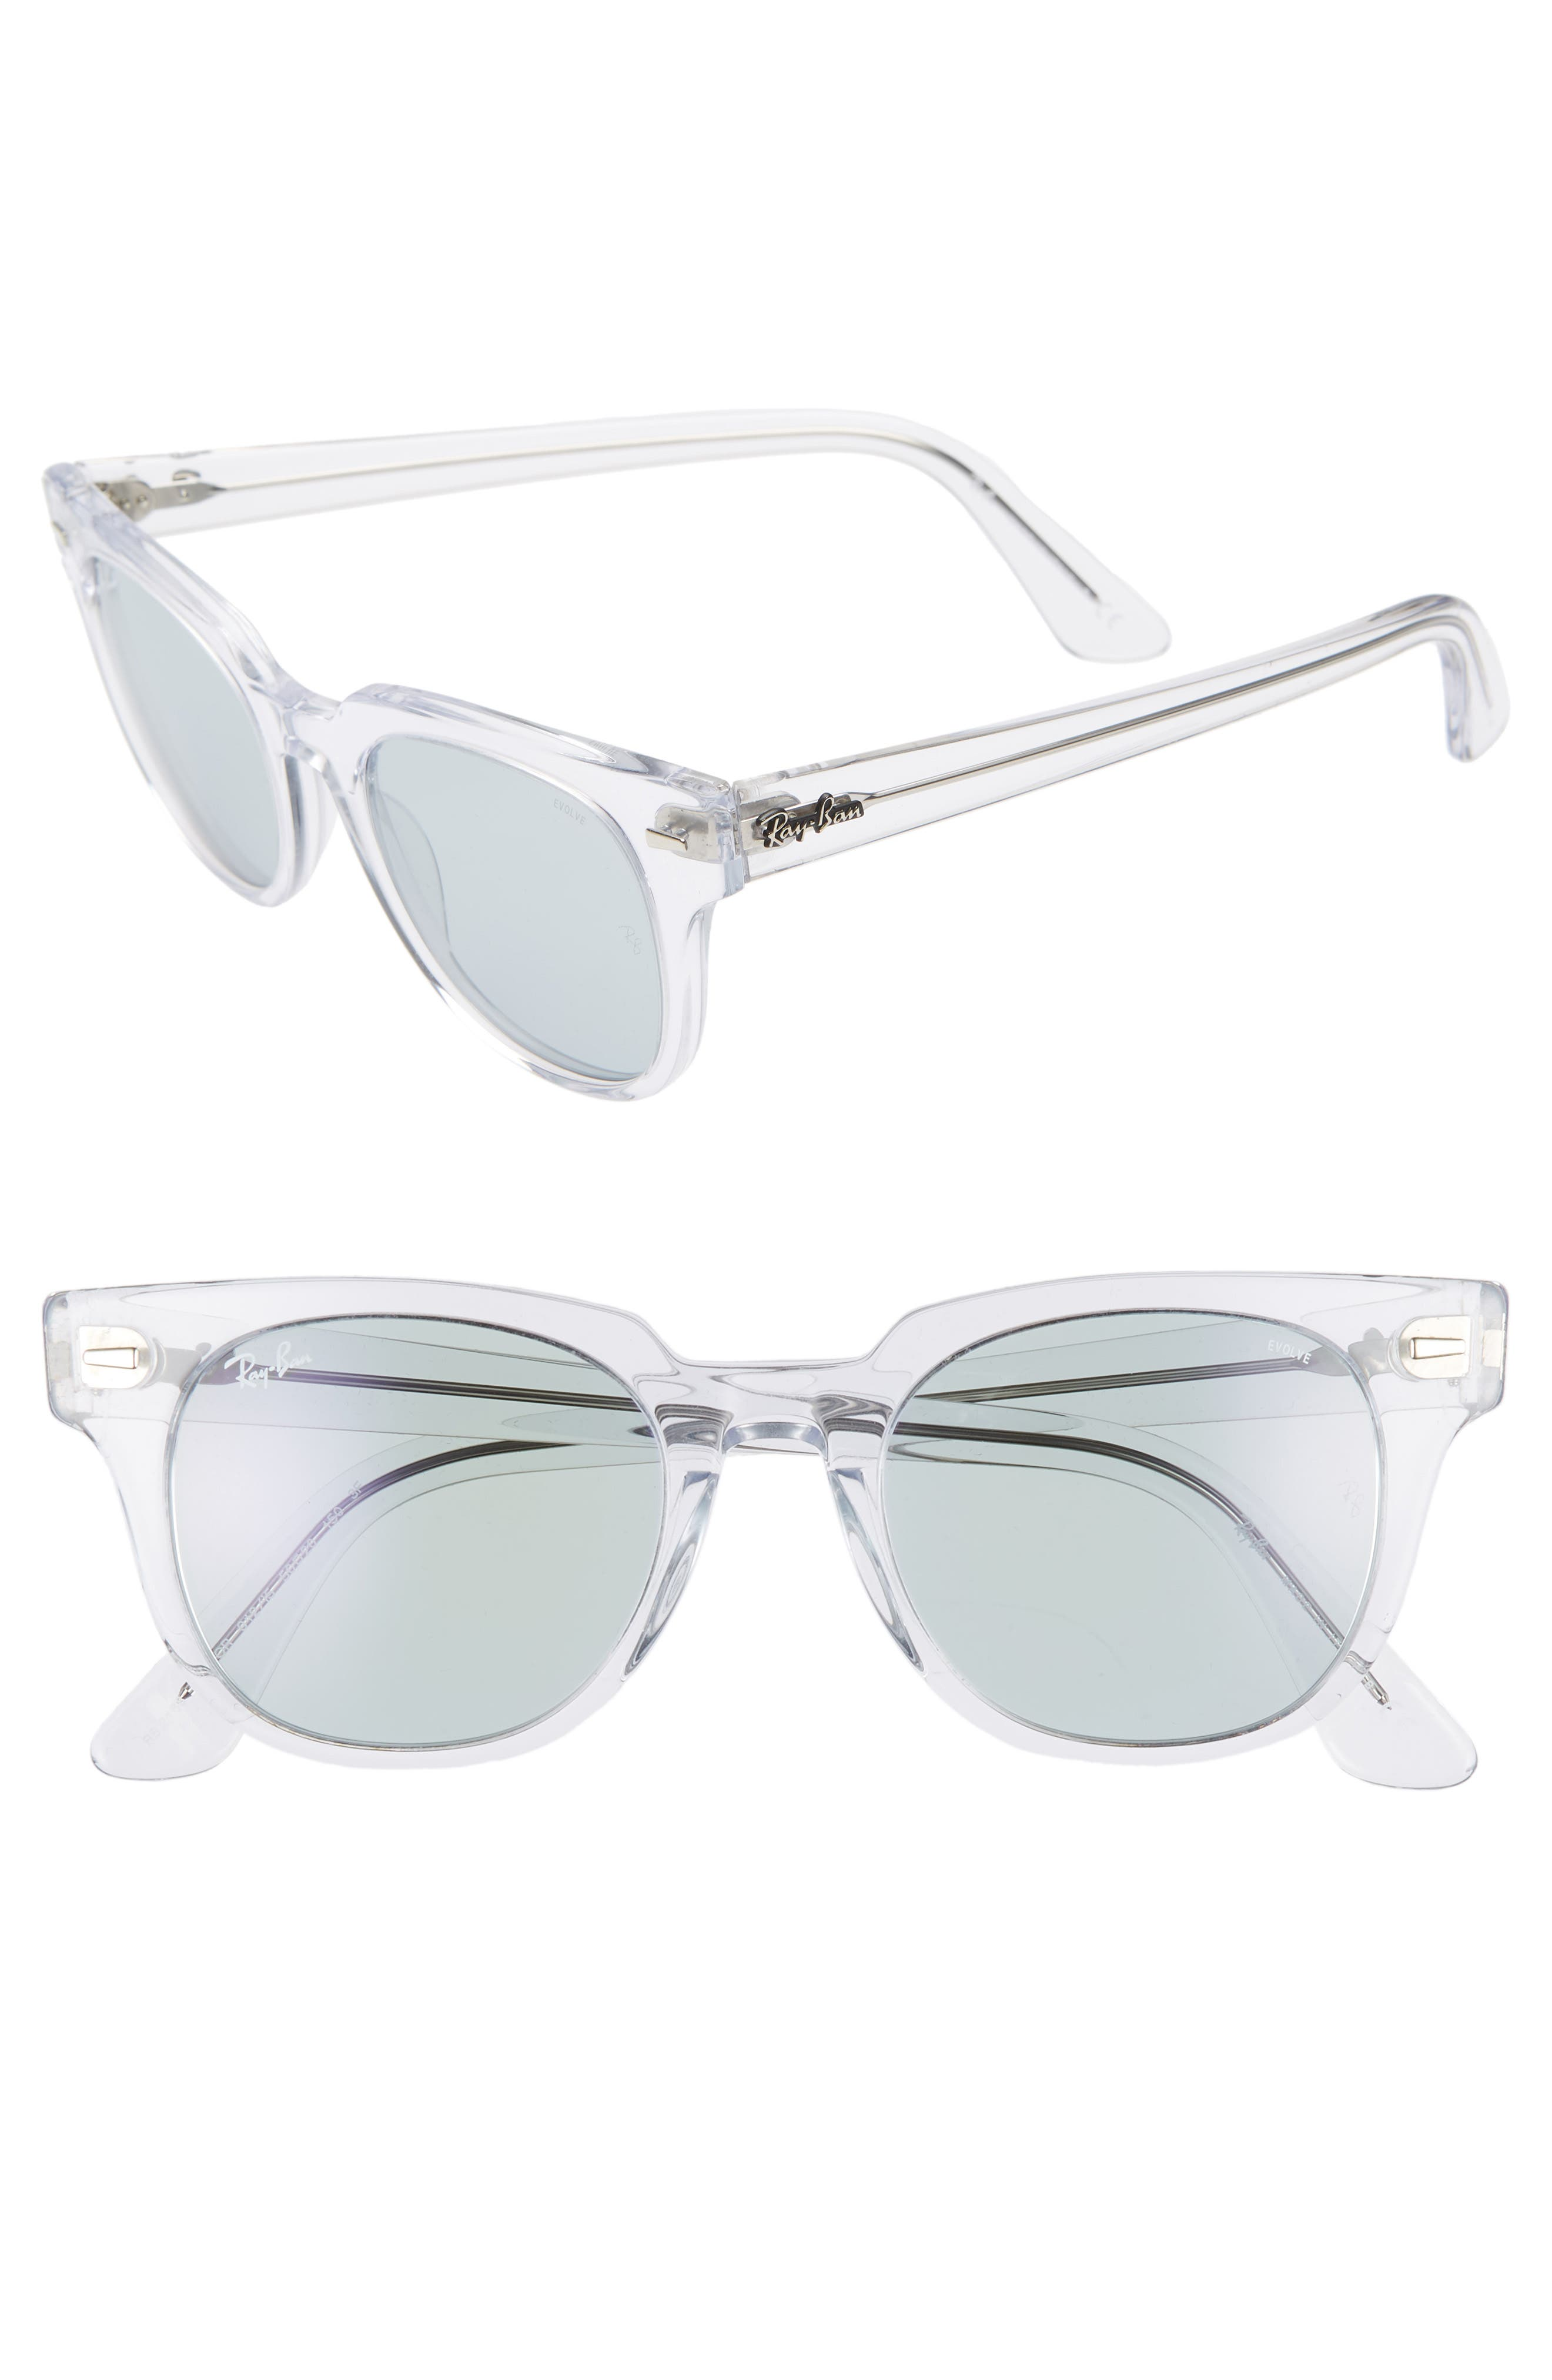 Ray-Ban Meteor 50Mm Wayfarer Photochromic Sunglasses - Crystal/ Blue Solid